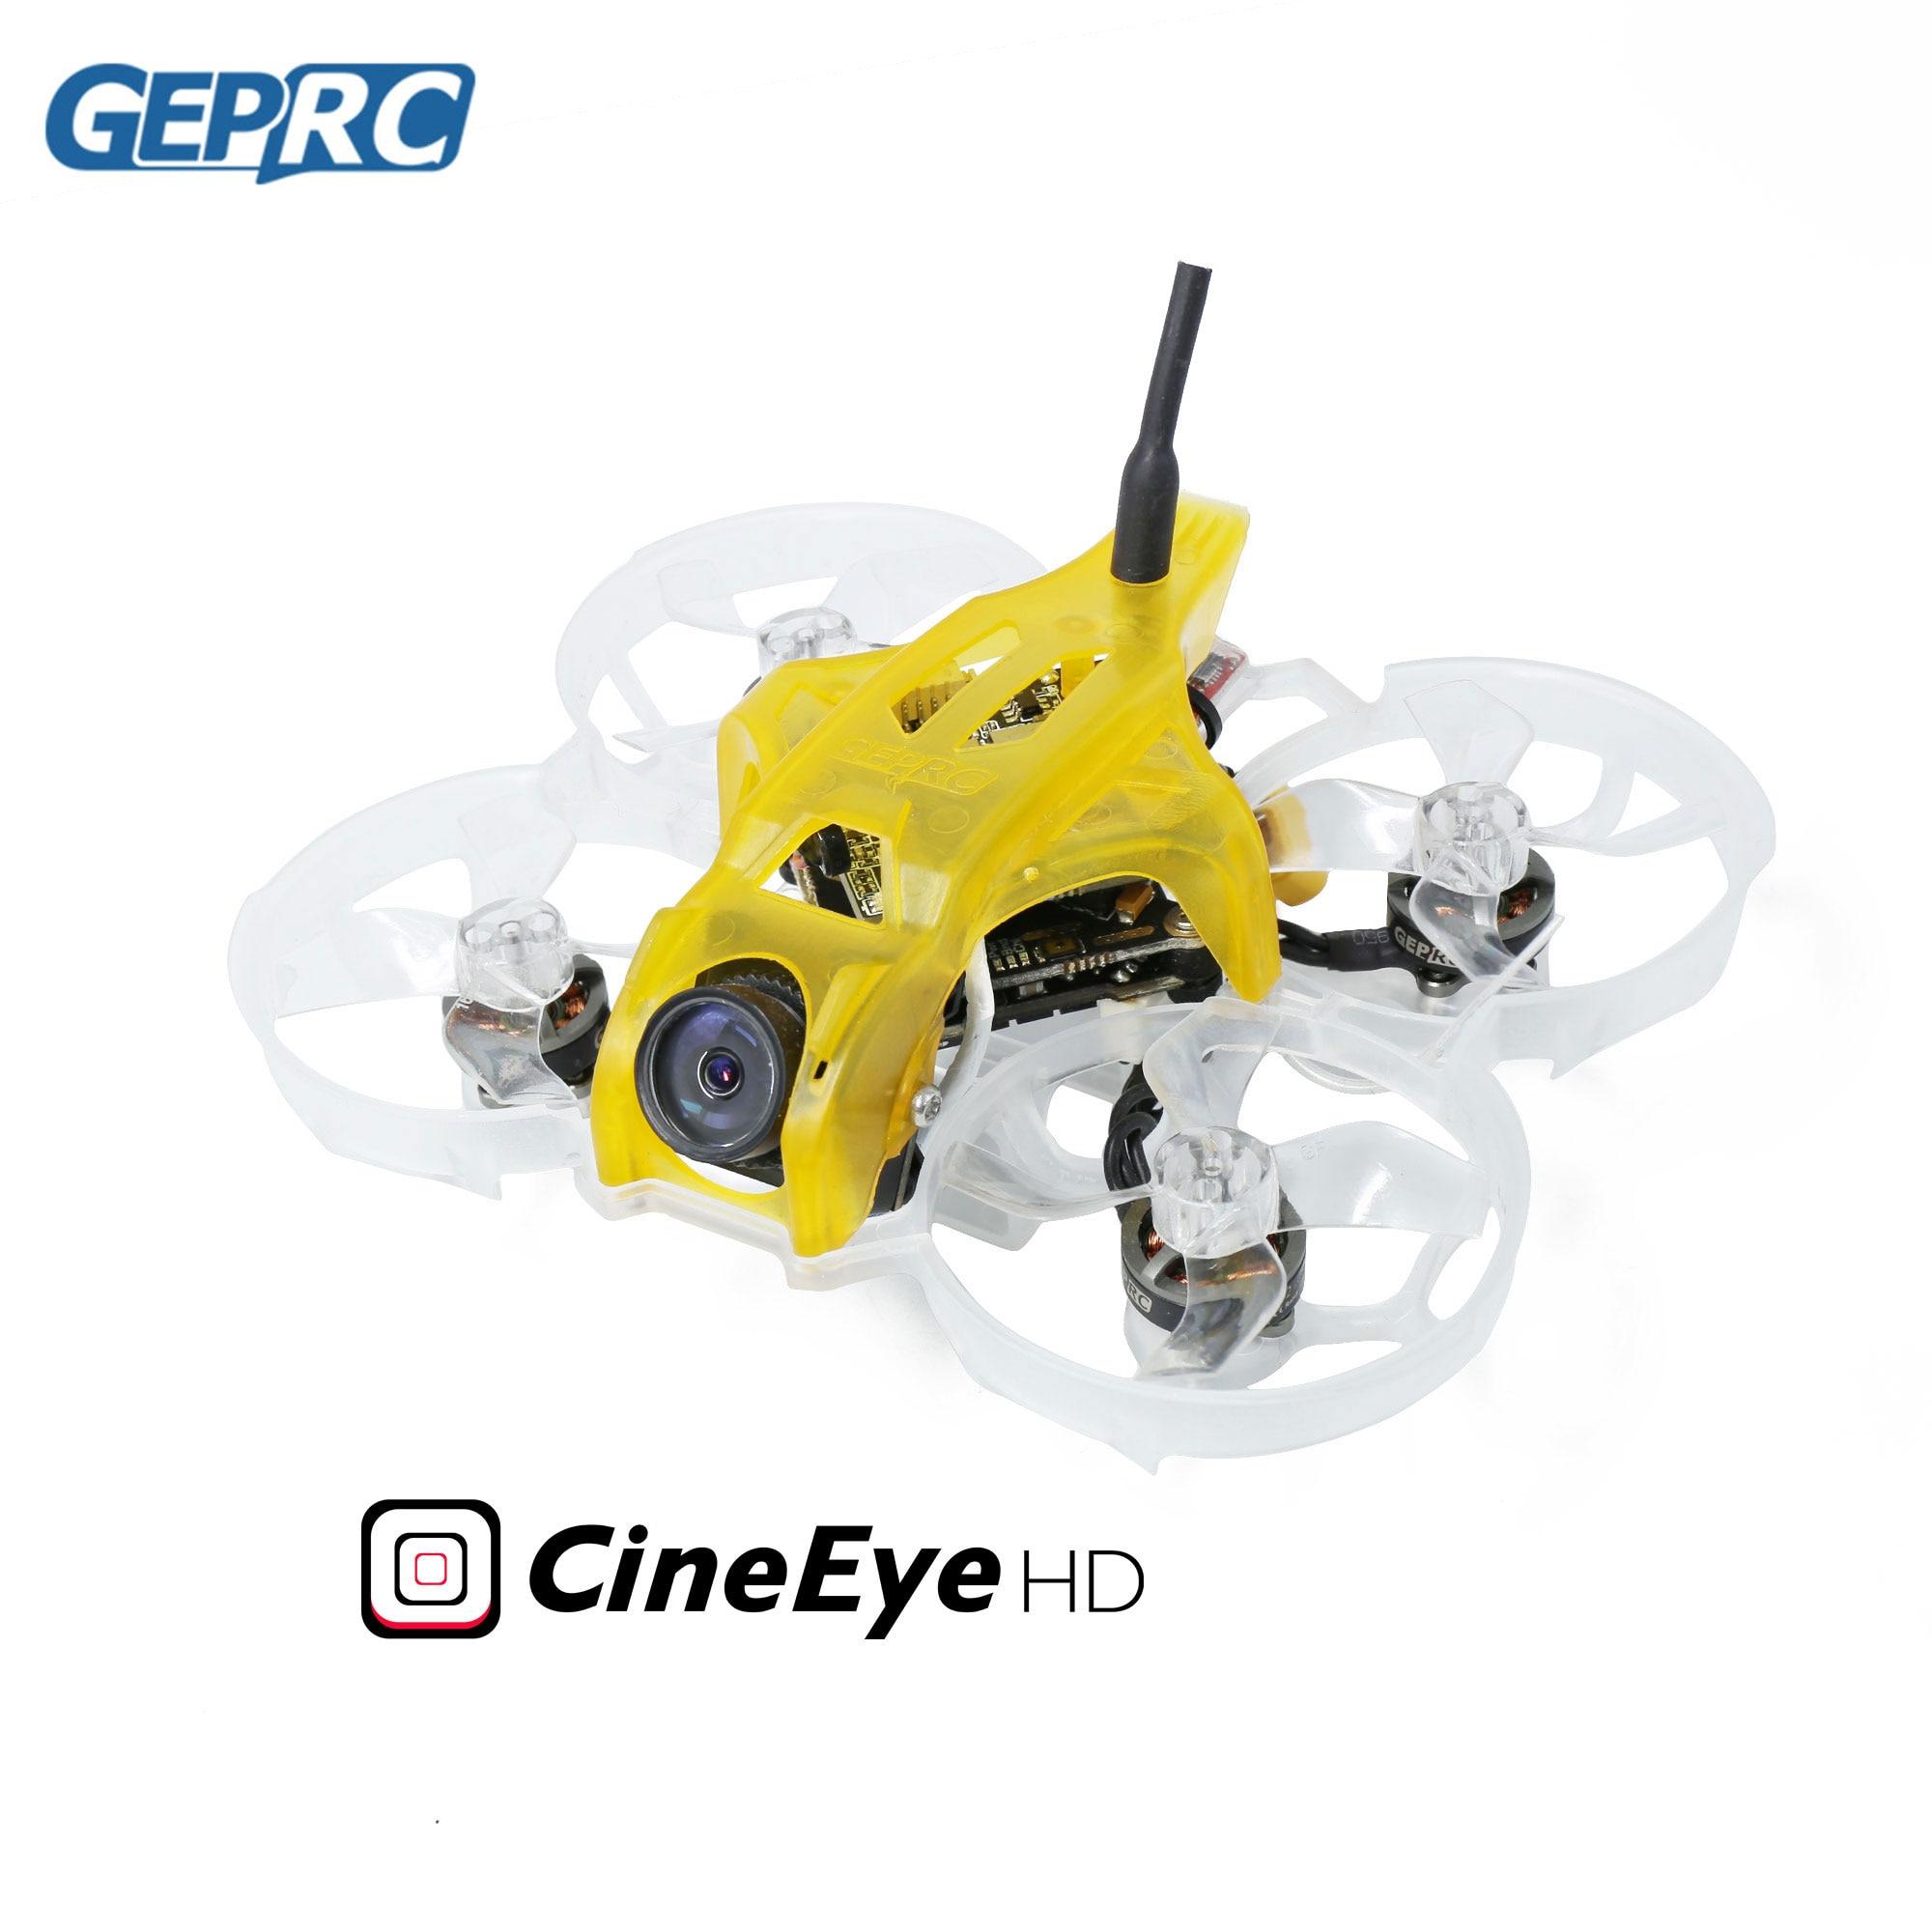 GEPRC CineEye 79mm GEP-12A-F4 con CADDX tortuga V2 cámara interior Whoop FPV Drone RC Drone